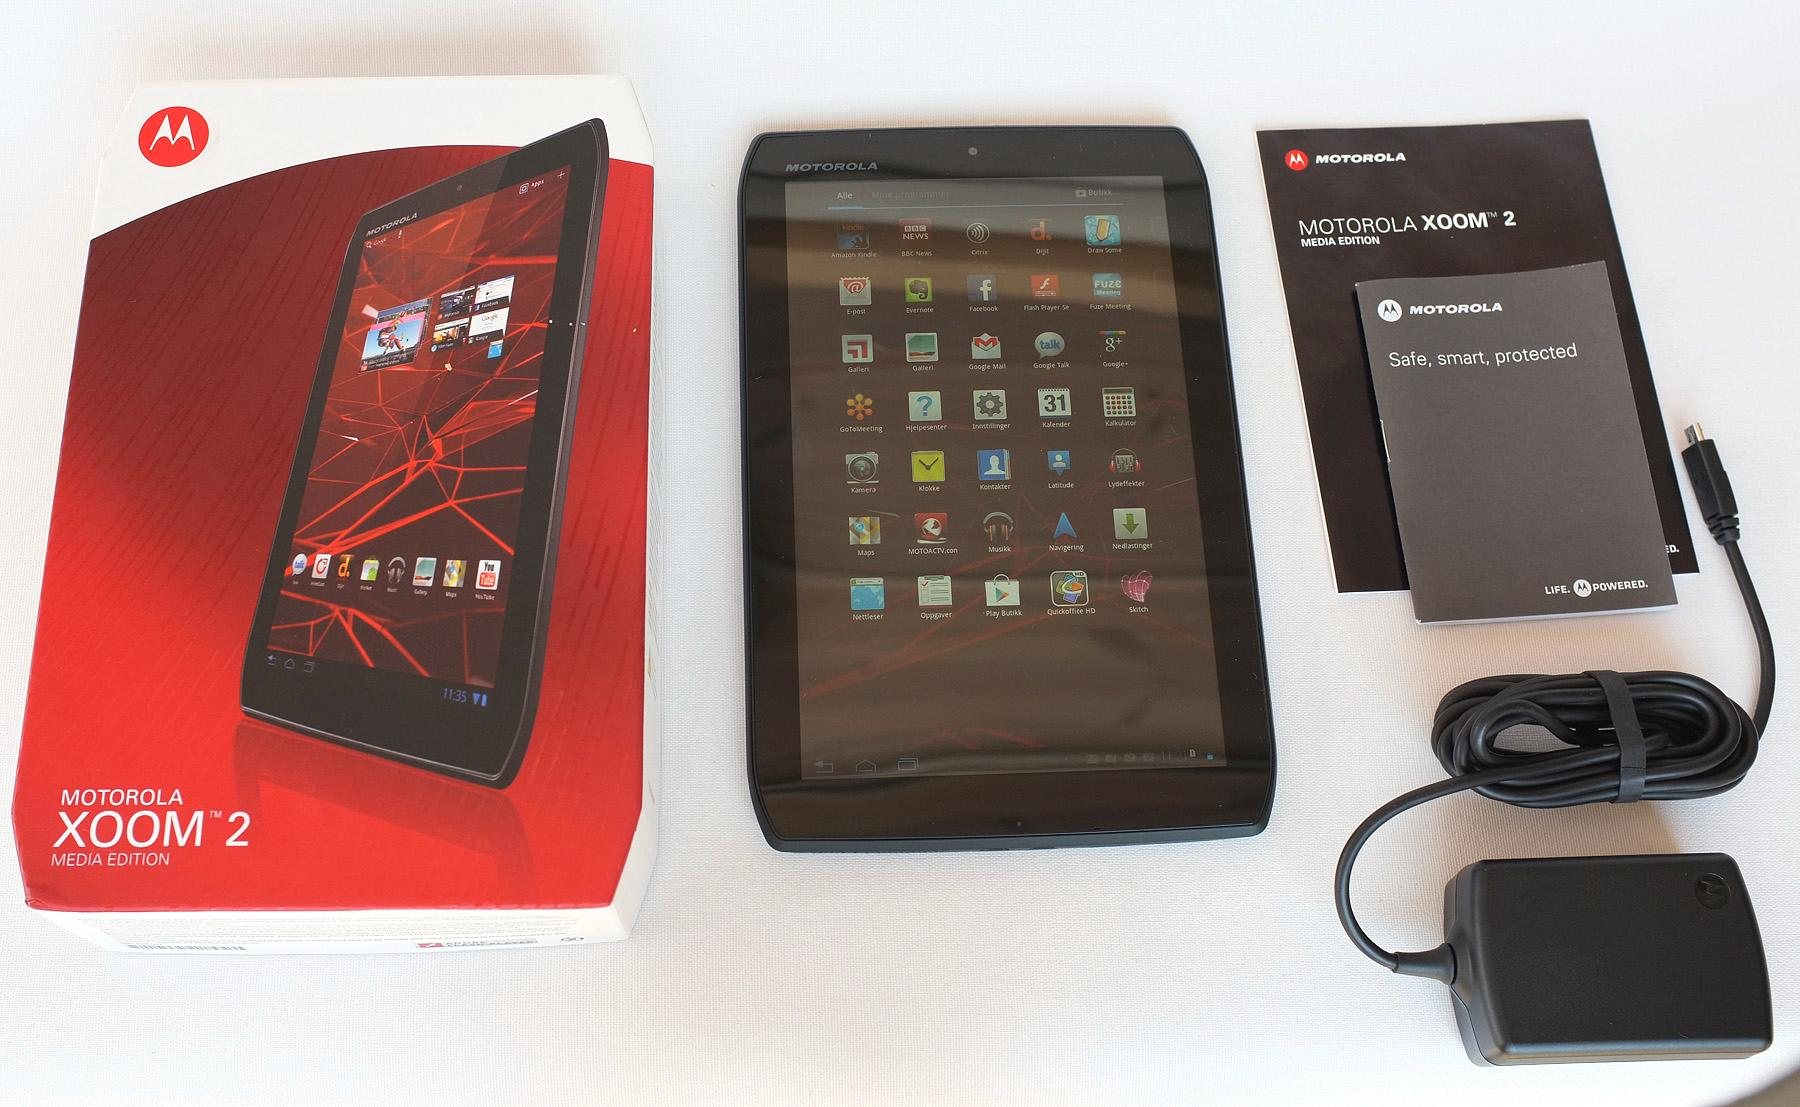 Motorola Xoom 2 Media Edition salgspakke.Foto: Audun M. Solheim